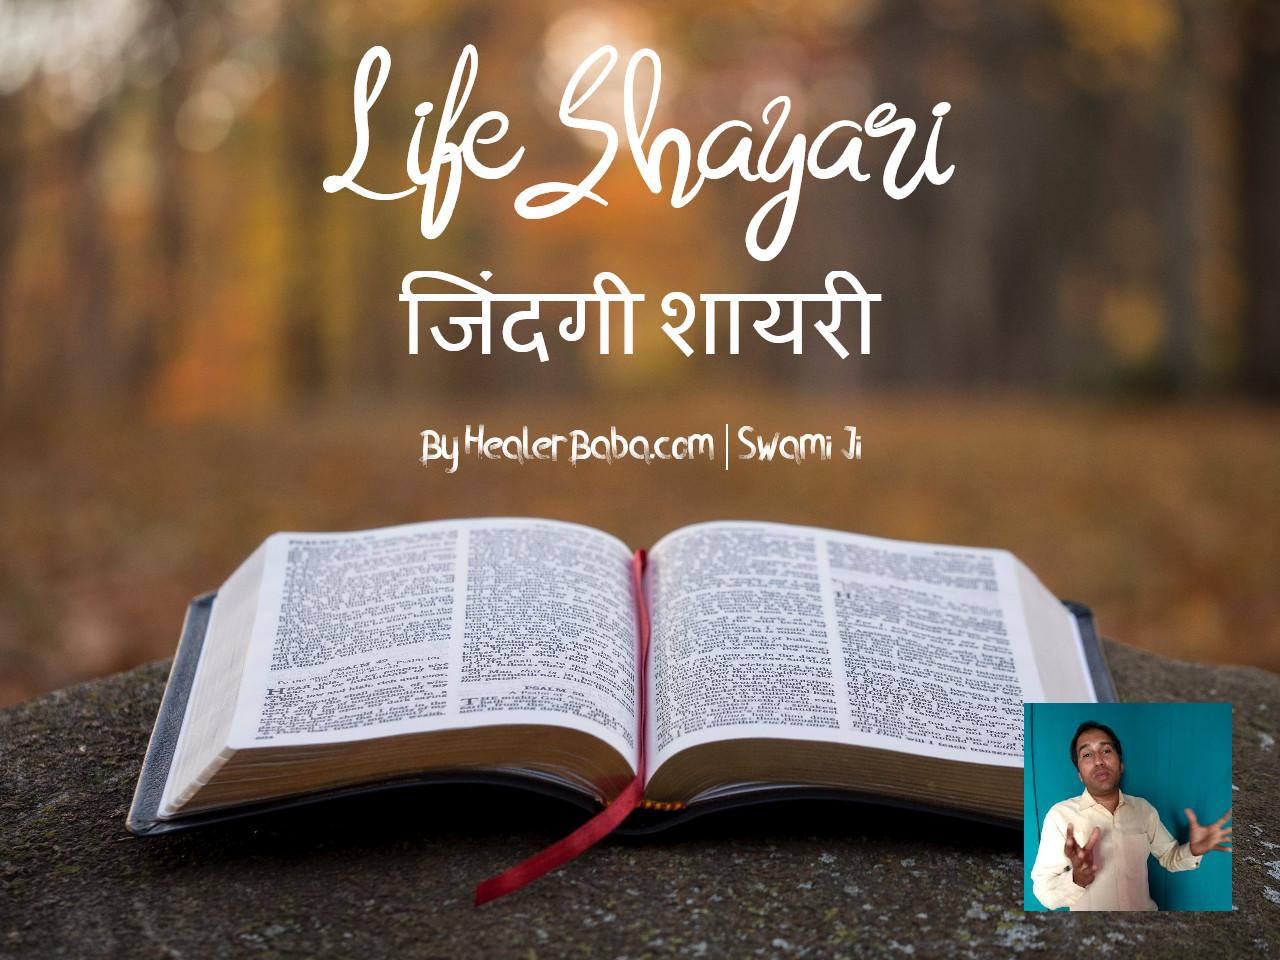 Life Shayari | जिंदगी शायरी